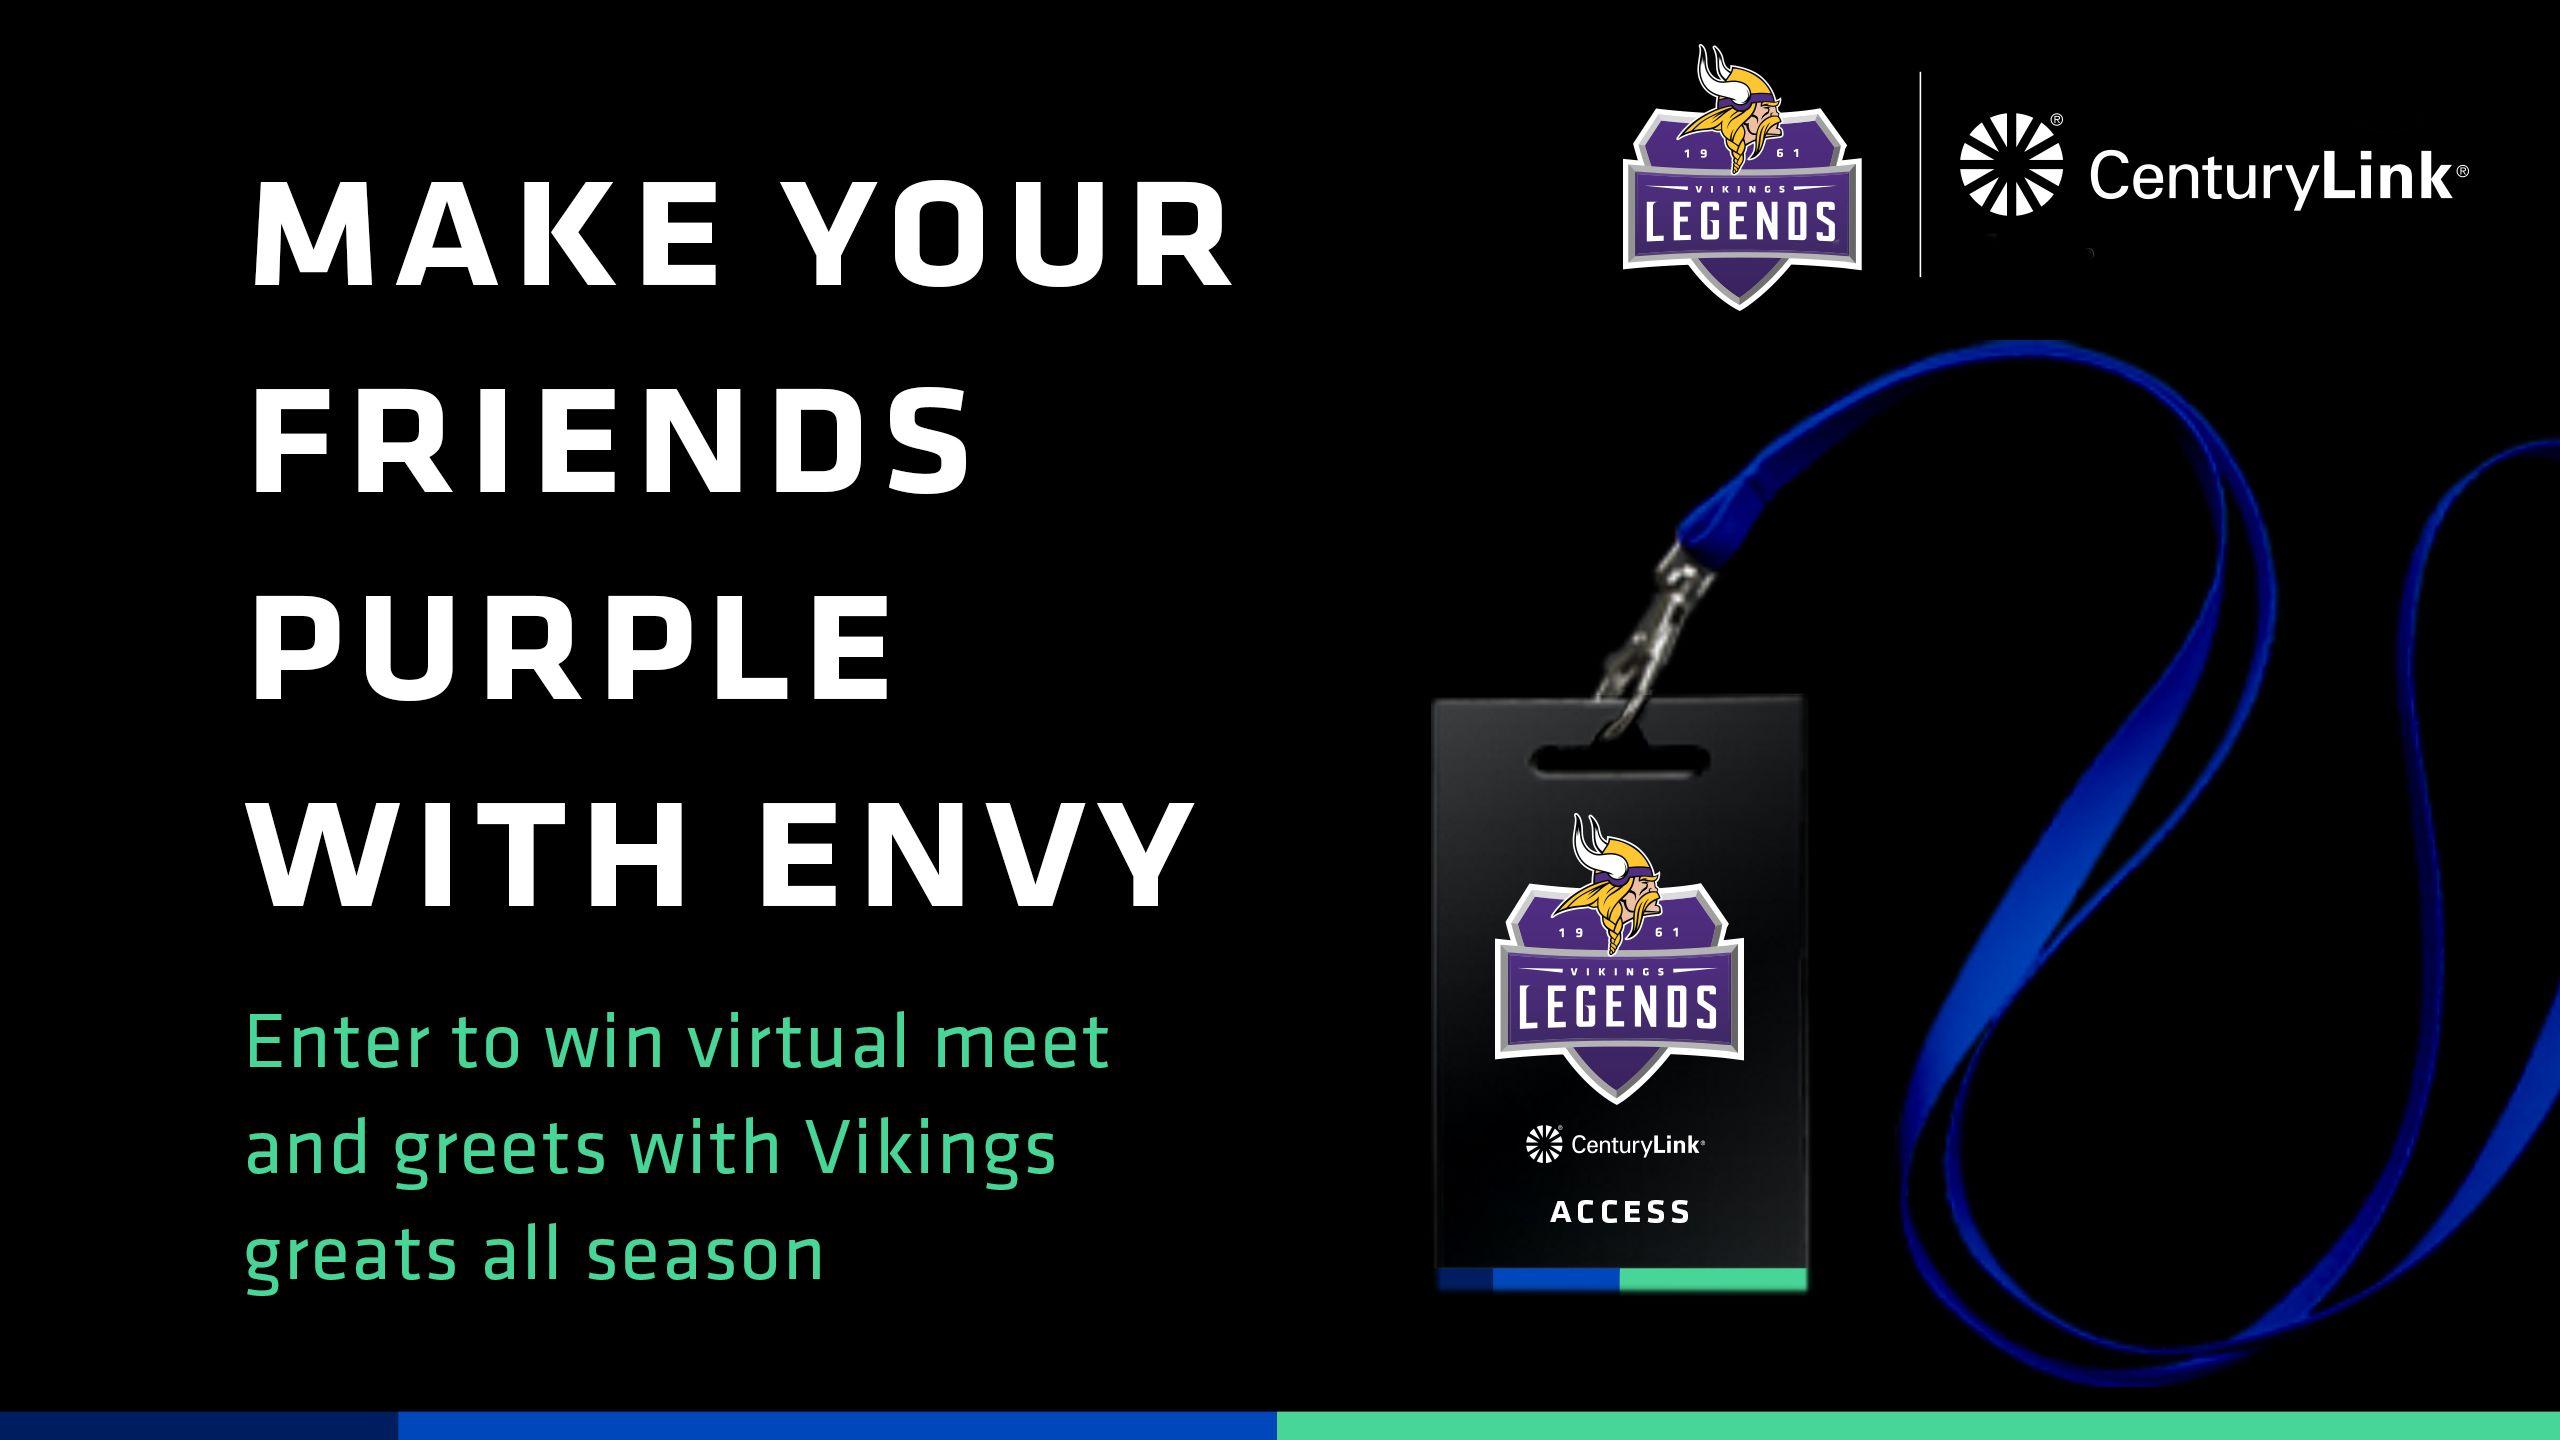 2560x1440_Vikings_Legends_CentuyLink